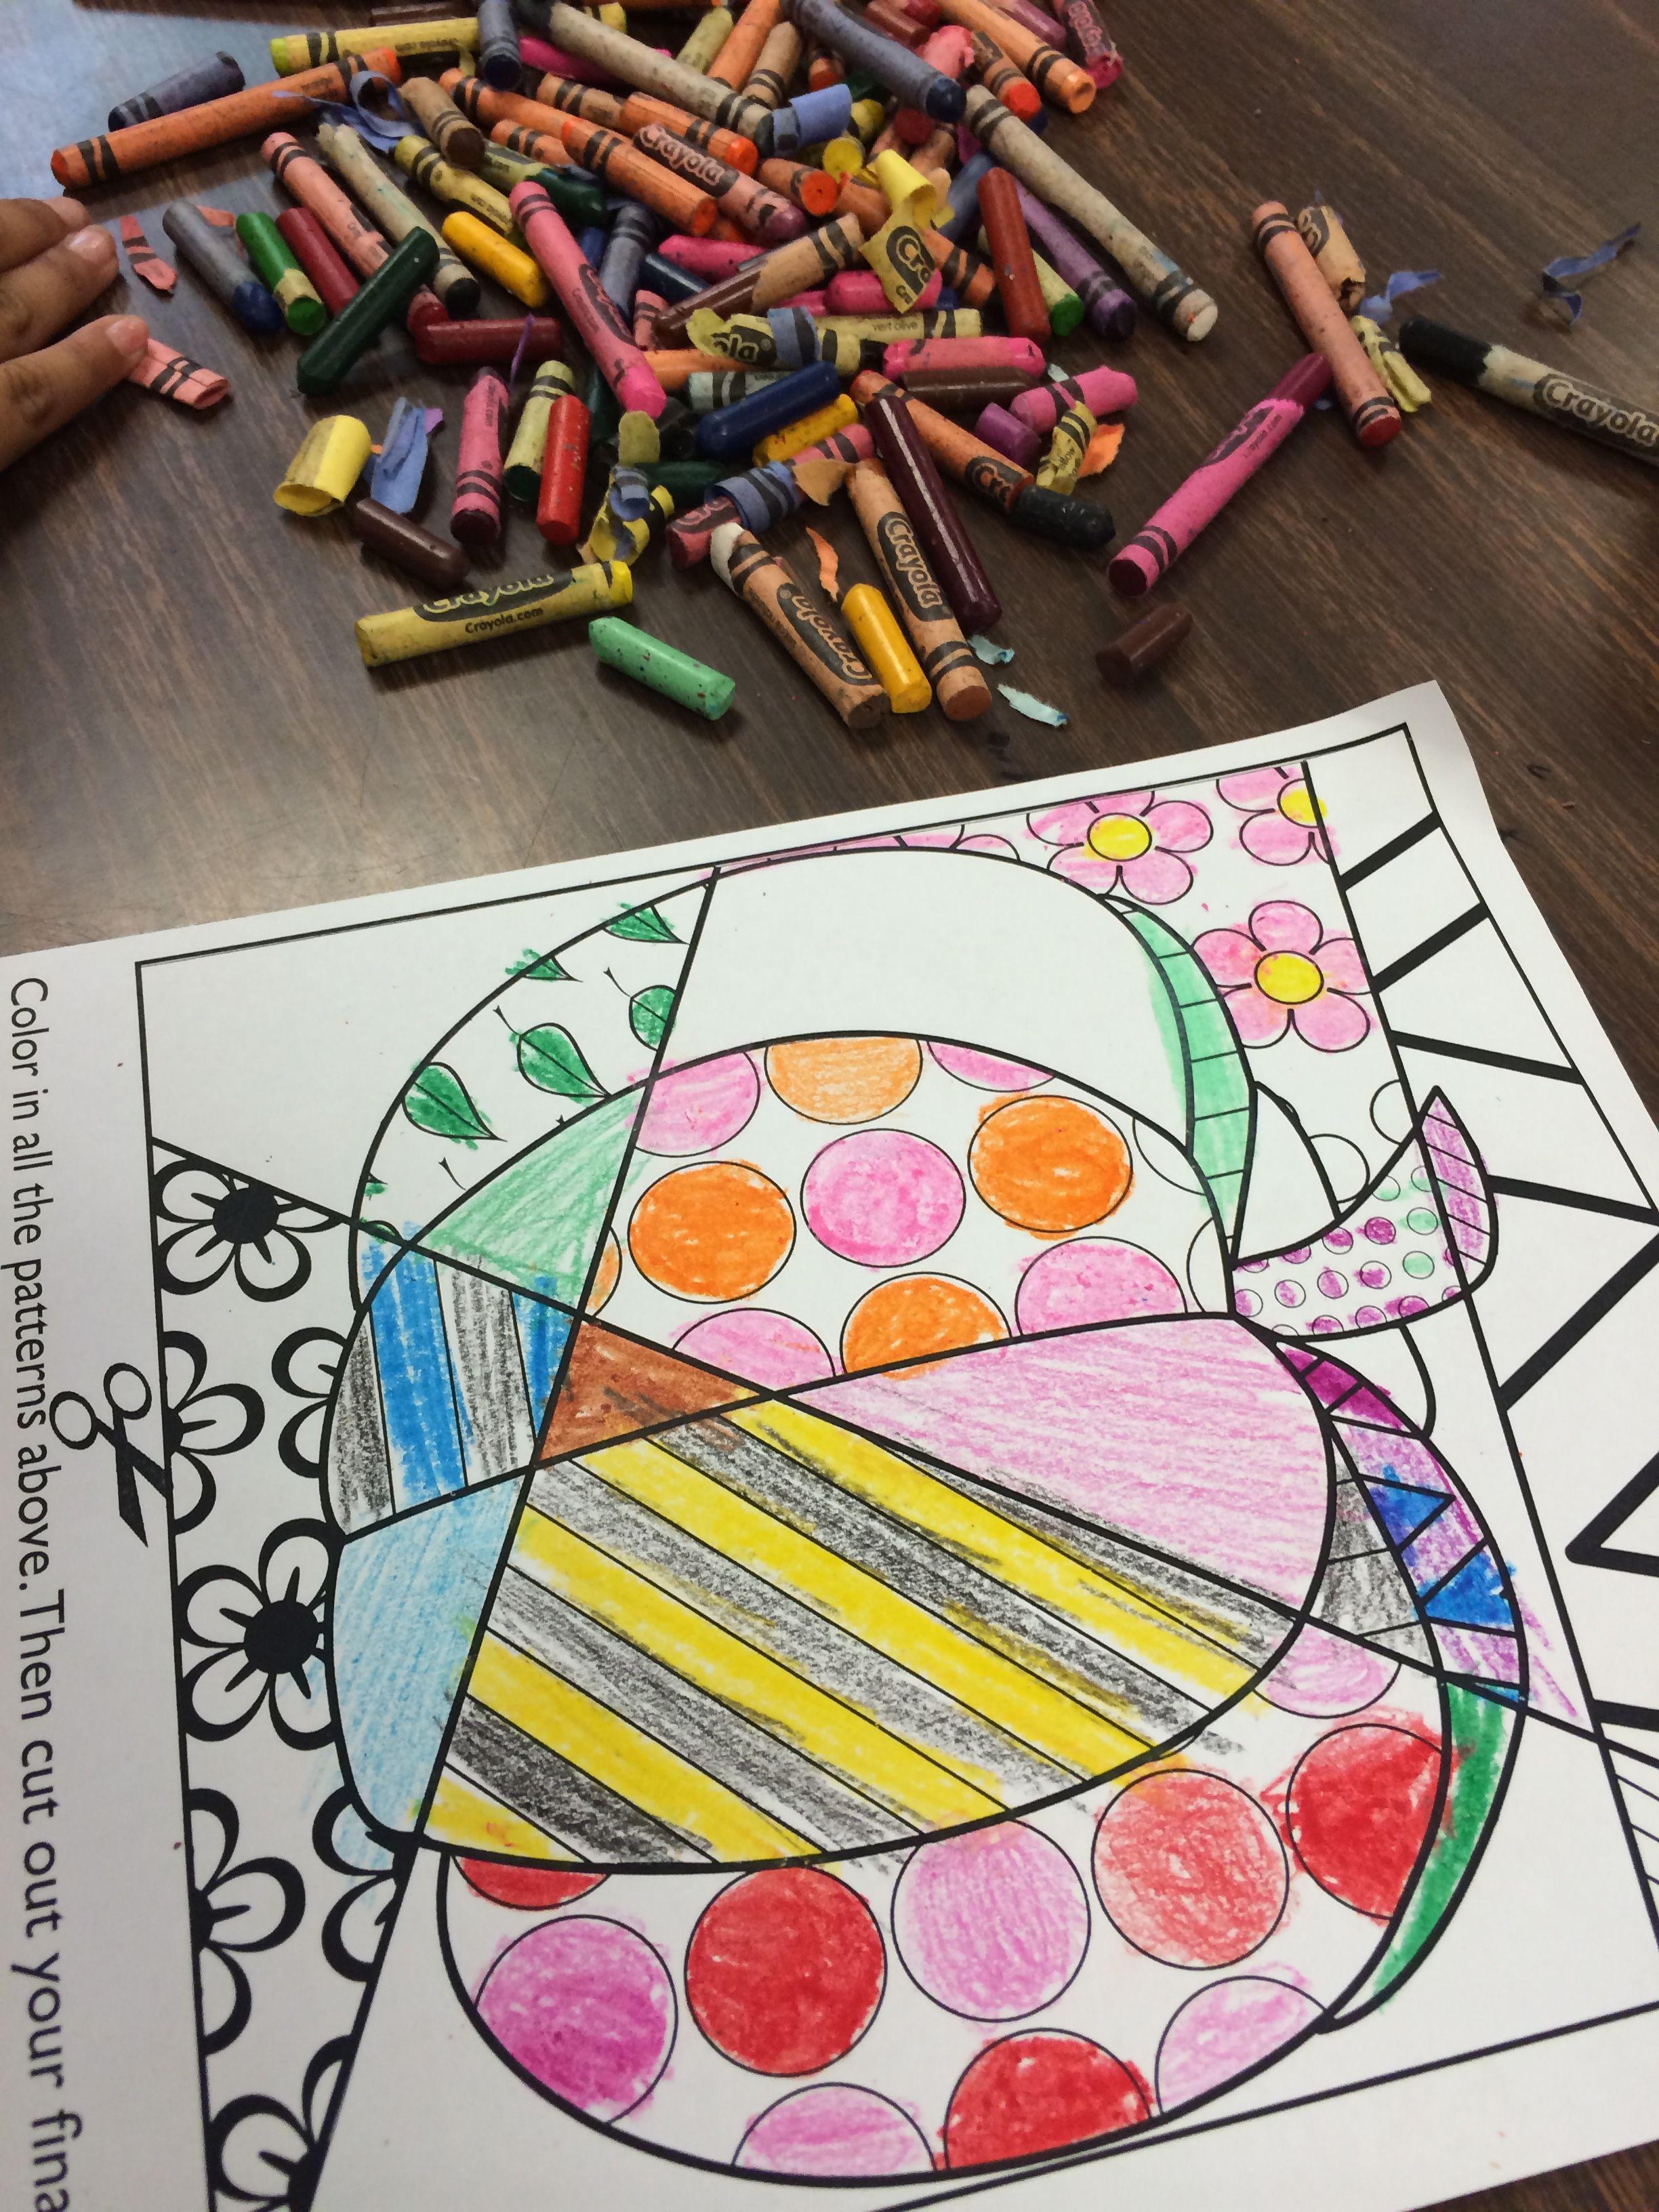 Crayola Pop Art Coloring Pages